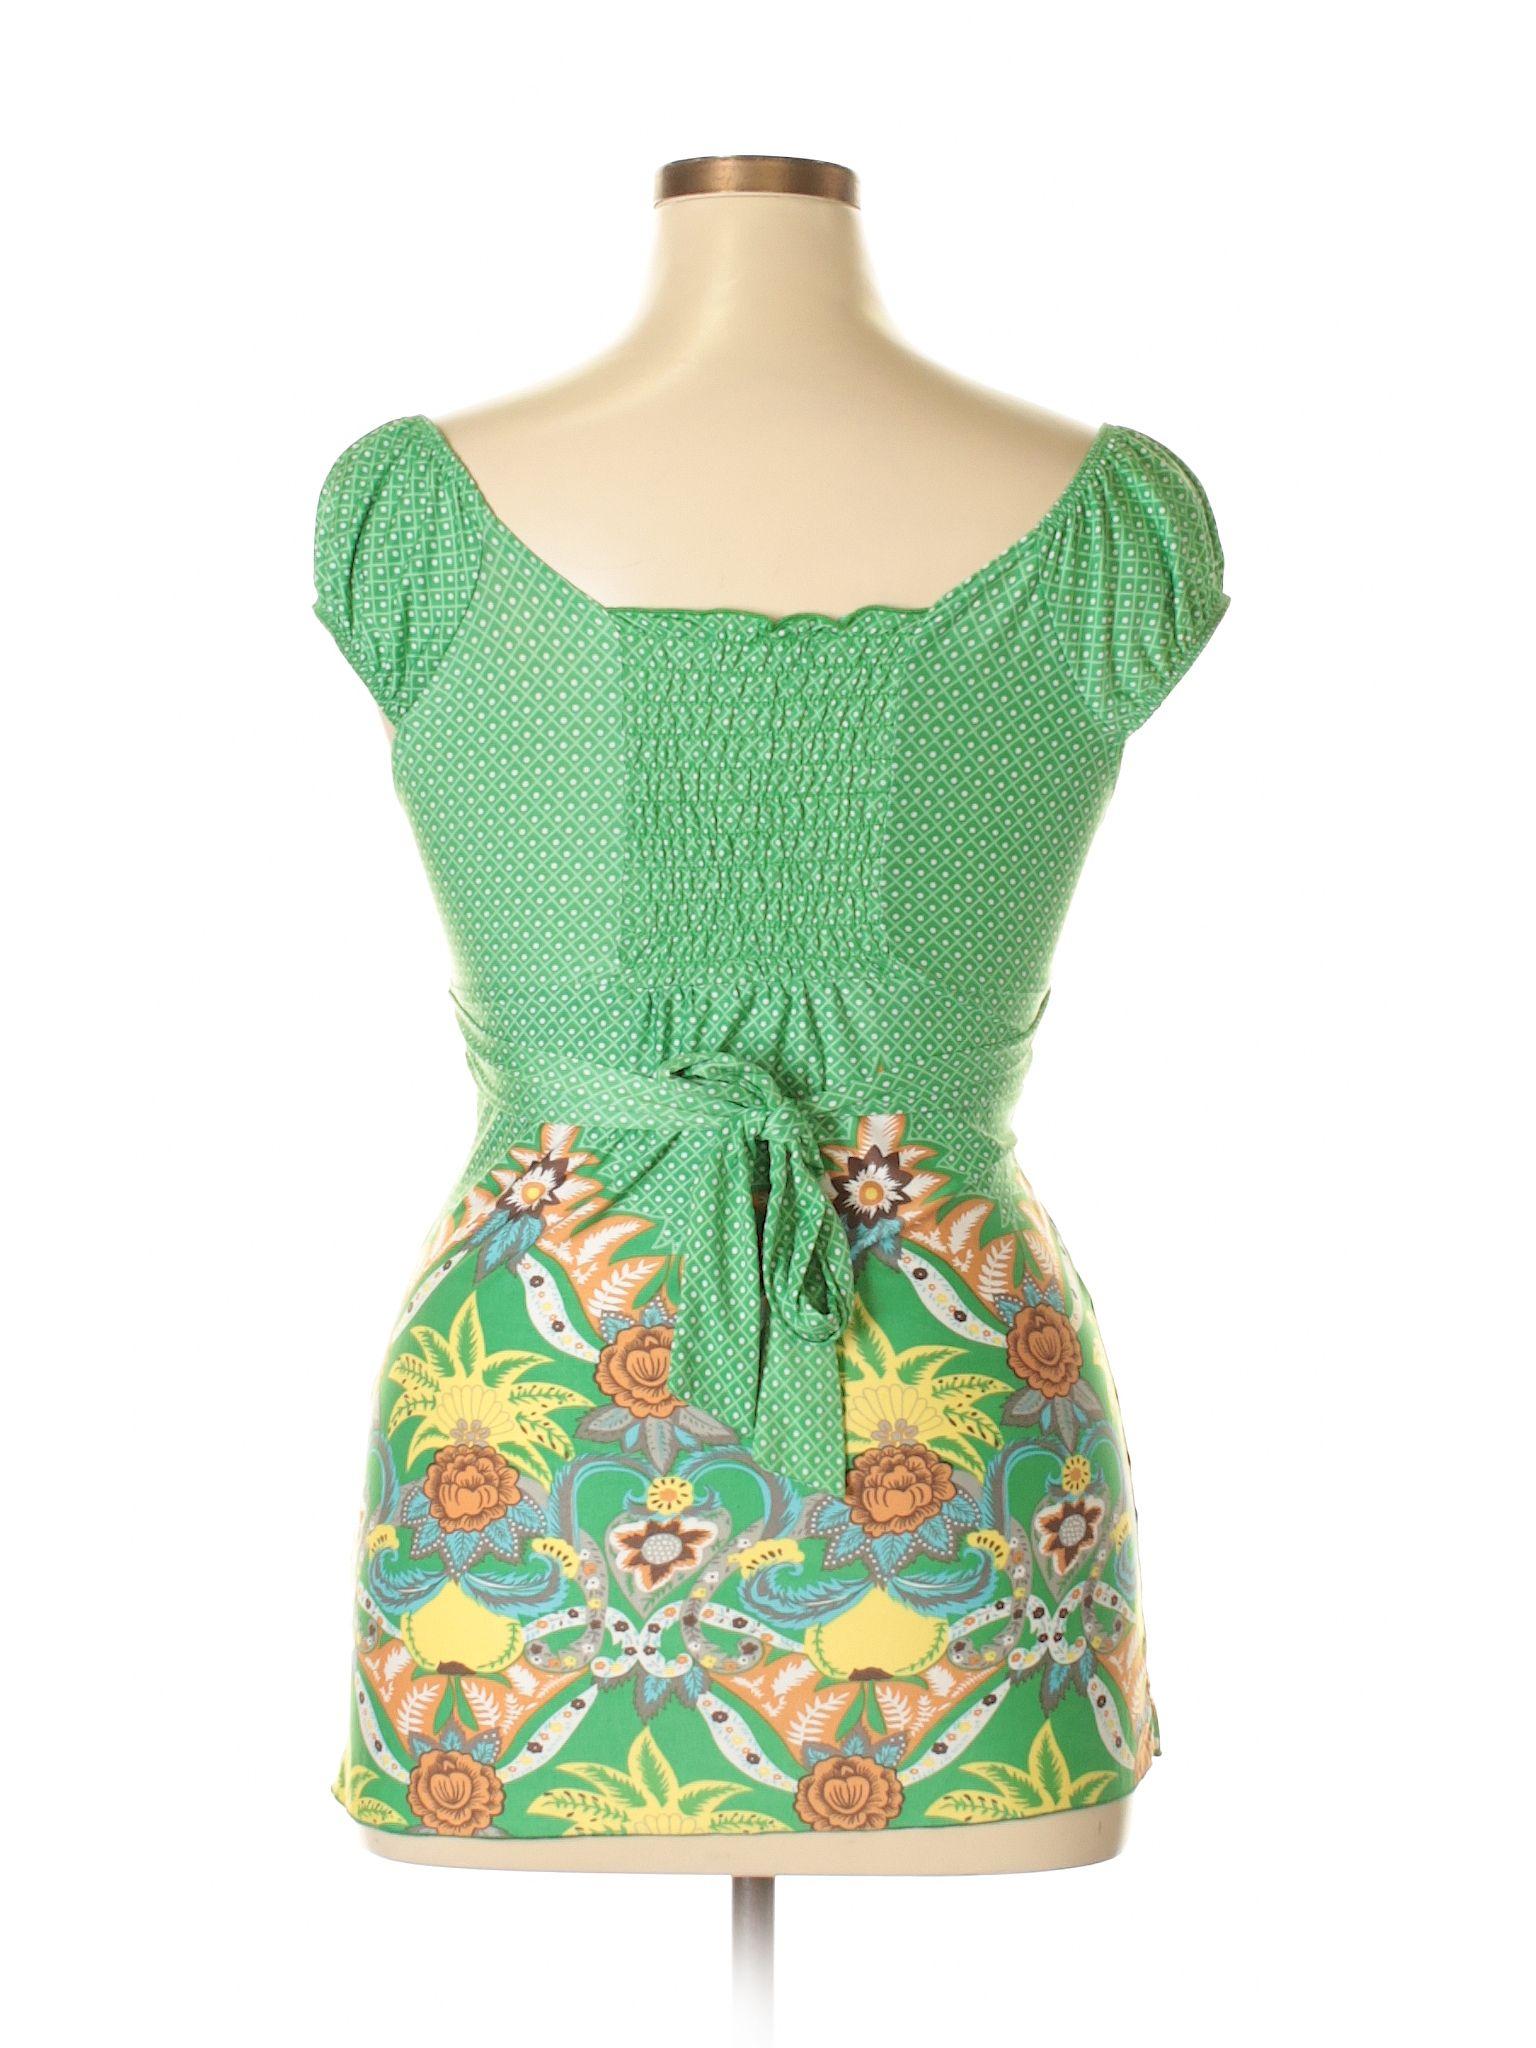 Papaya Sleeveless Blouse Size 1200 Green Womens Tops  $699